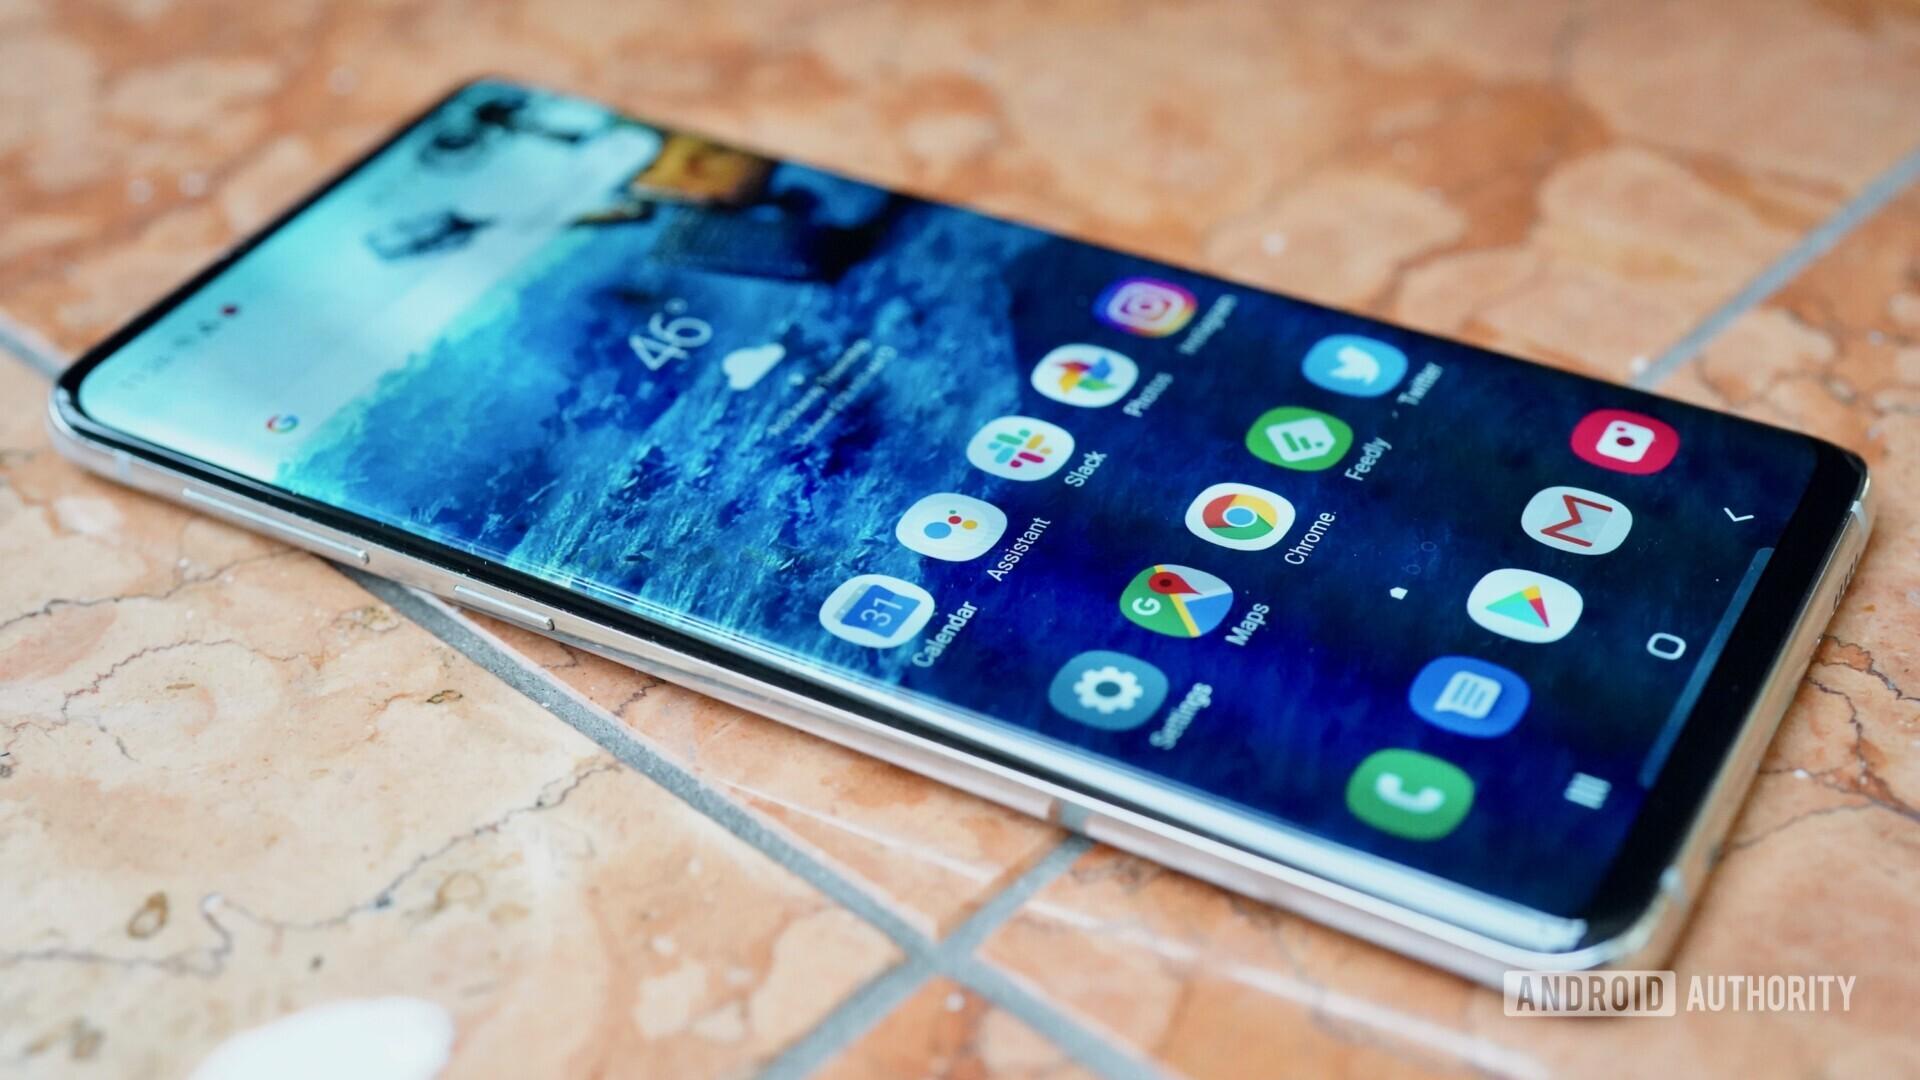 Samsung Galaxy S10 and Galaxy s10e deal